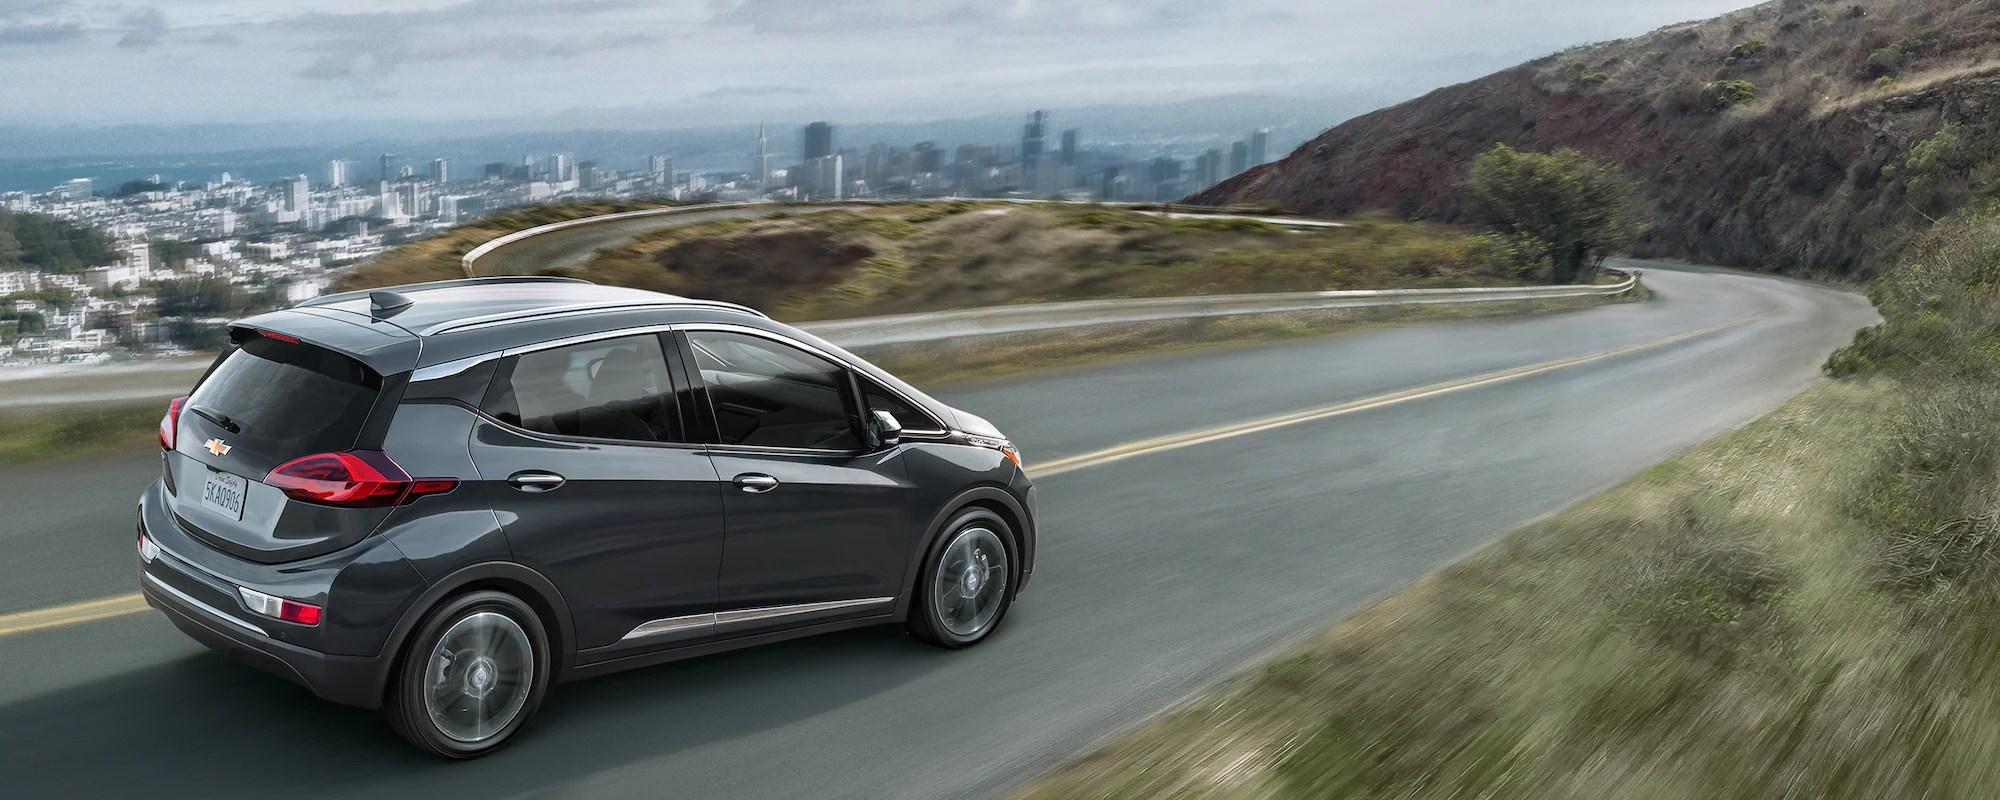 small resolution of 2019 bolt ev electric car an affordable all electric car evs car alarm wiring diagram 2